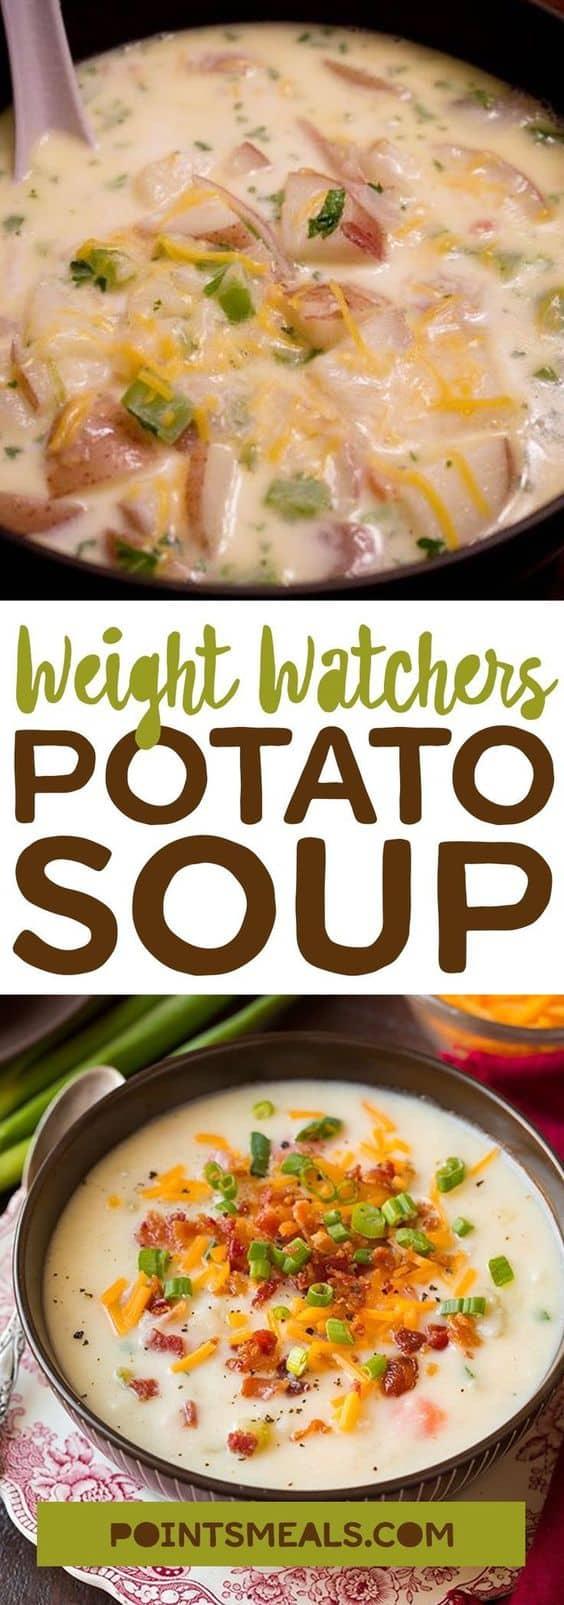 Potato Soup – Smartpoints 3